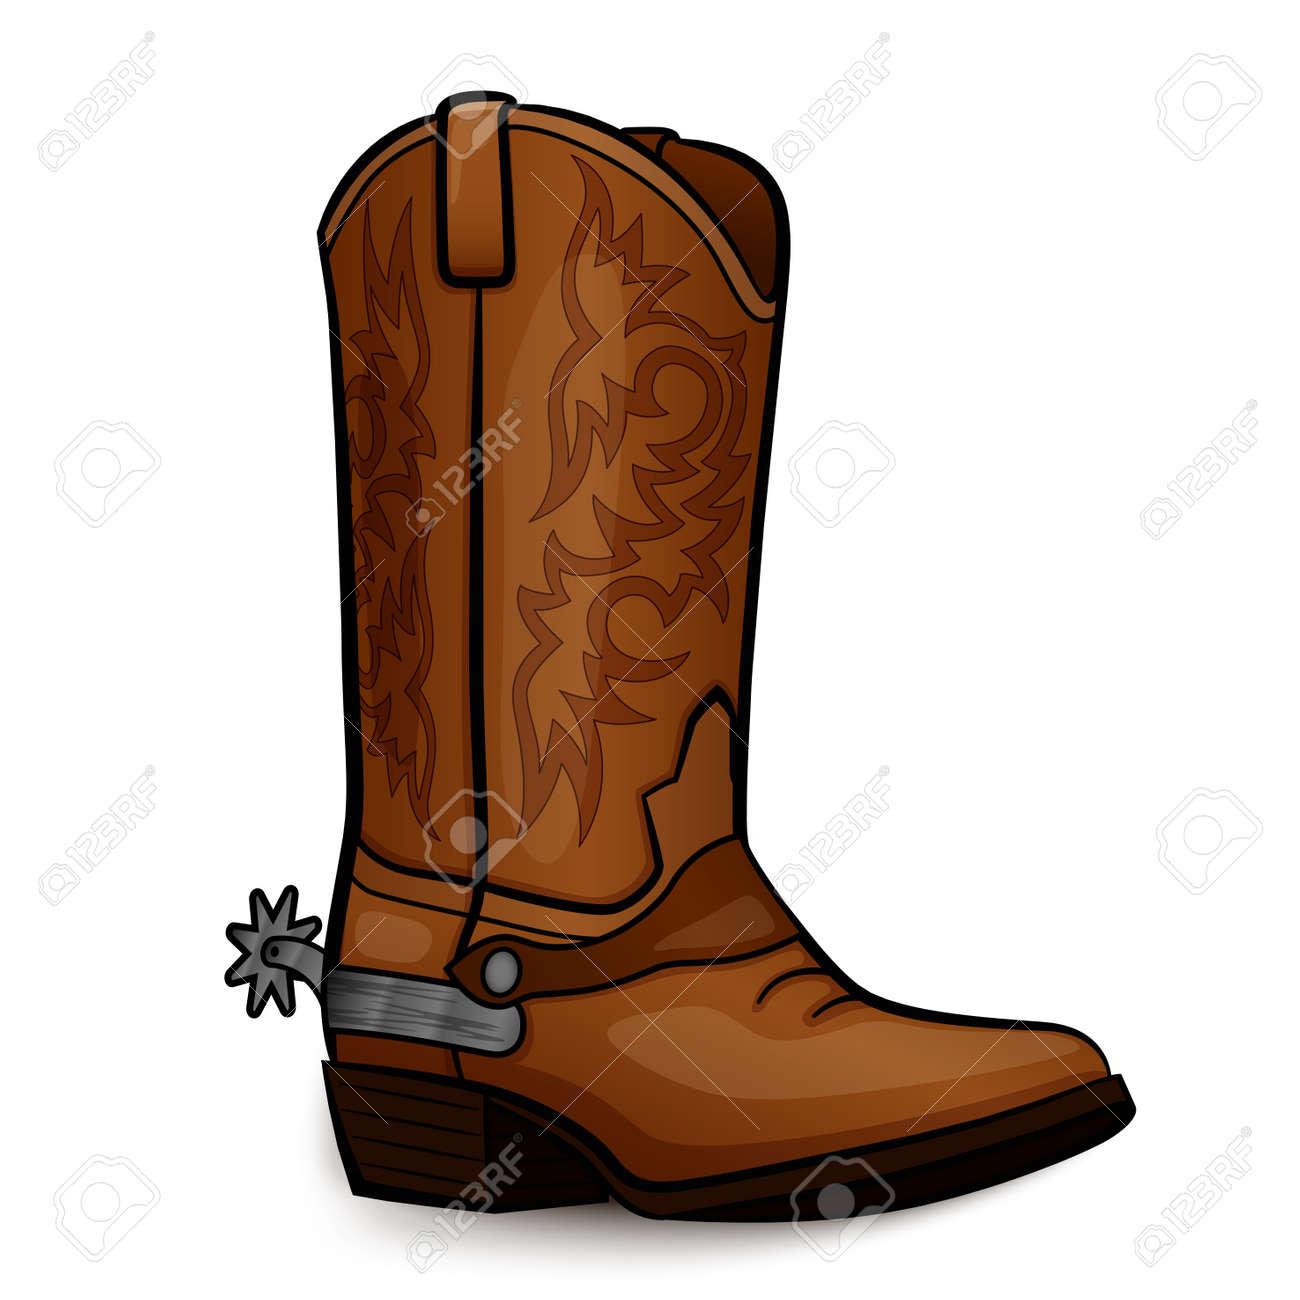 Vector illustration of cowboy boot brown design - 111870207